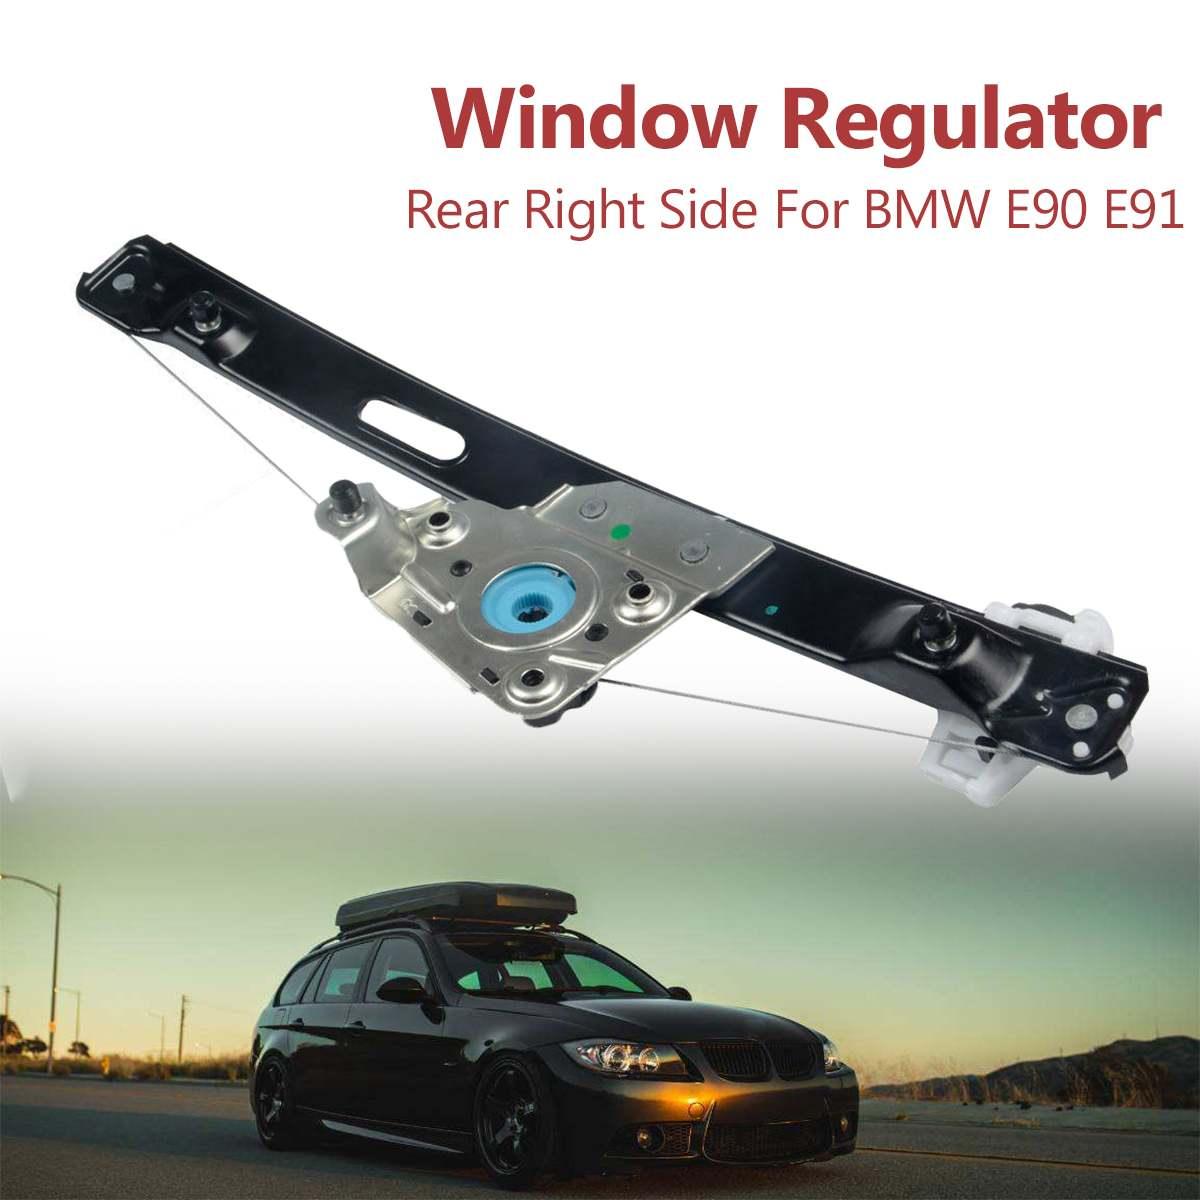 Auto voiture accessoires lève-vitre Driver pour BMW E90 E91 316 318i 320i 323i 325i 328i 330i M3 vitre latérale arrière droite